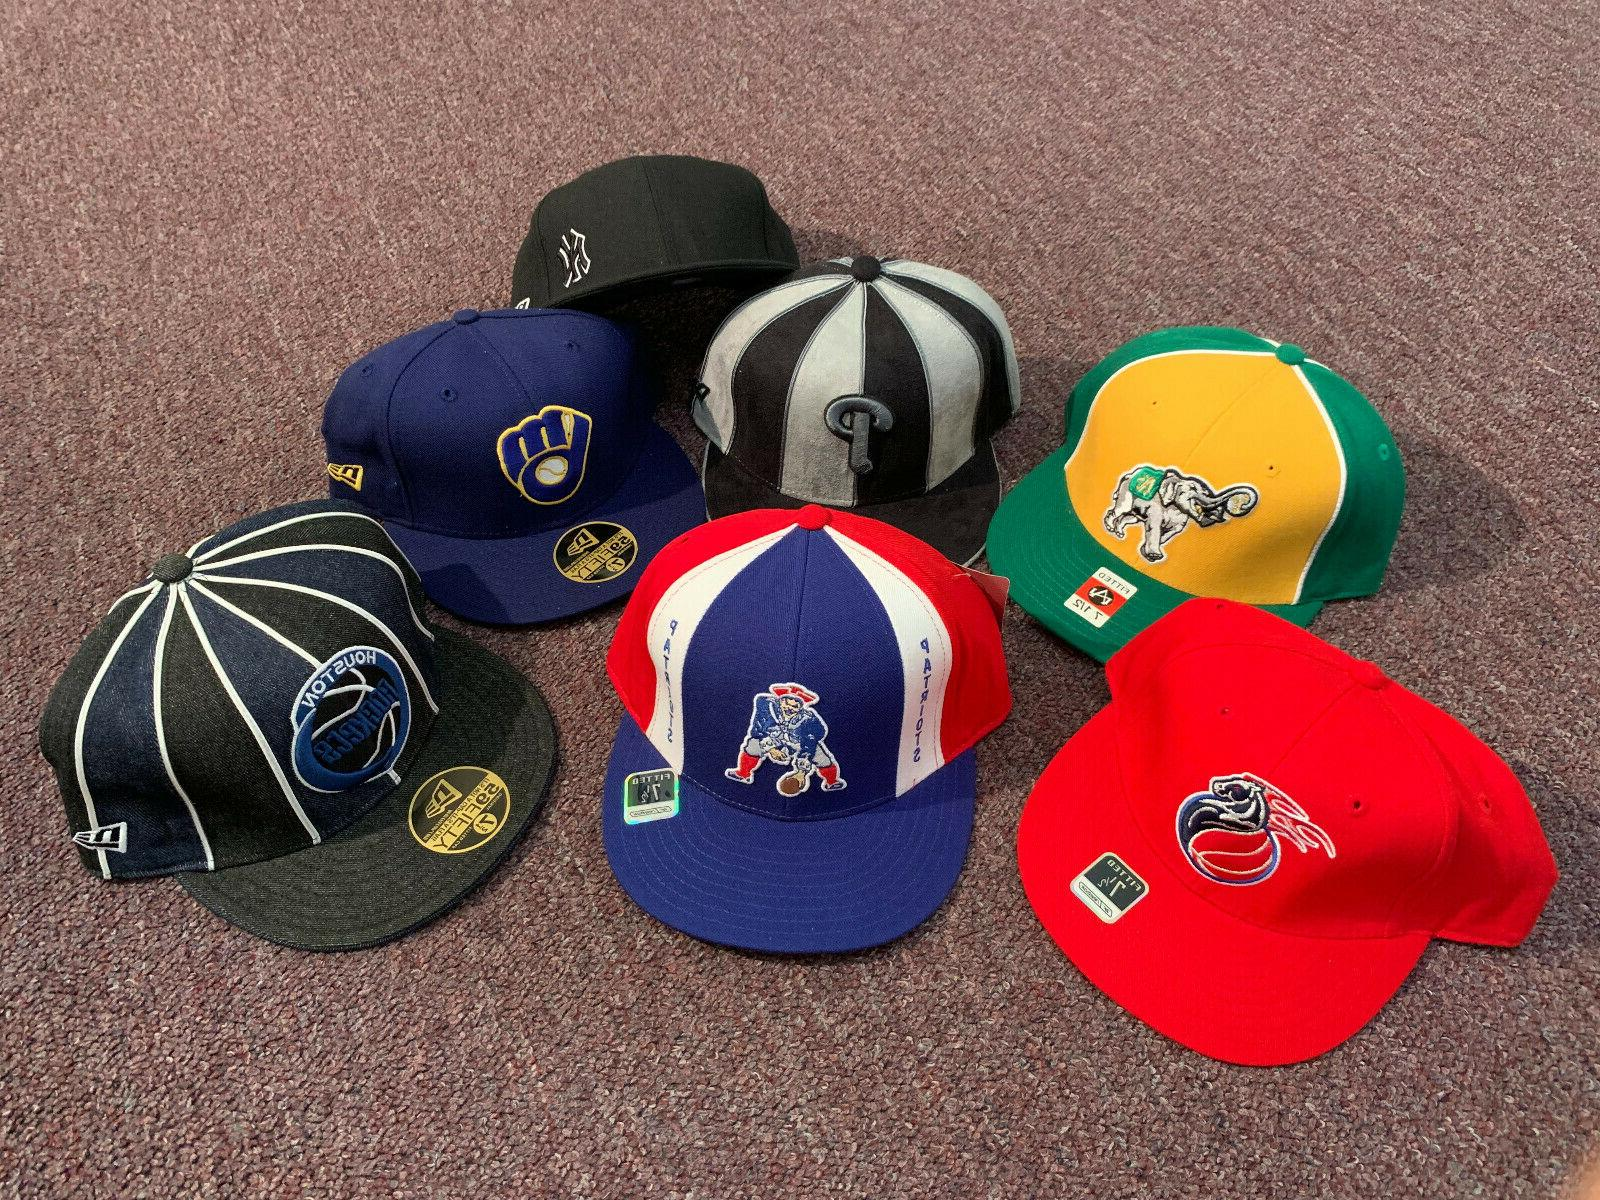 NBA Baseball Caps, 7-1/2, Reebok New Original